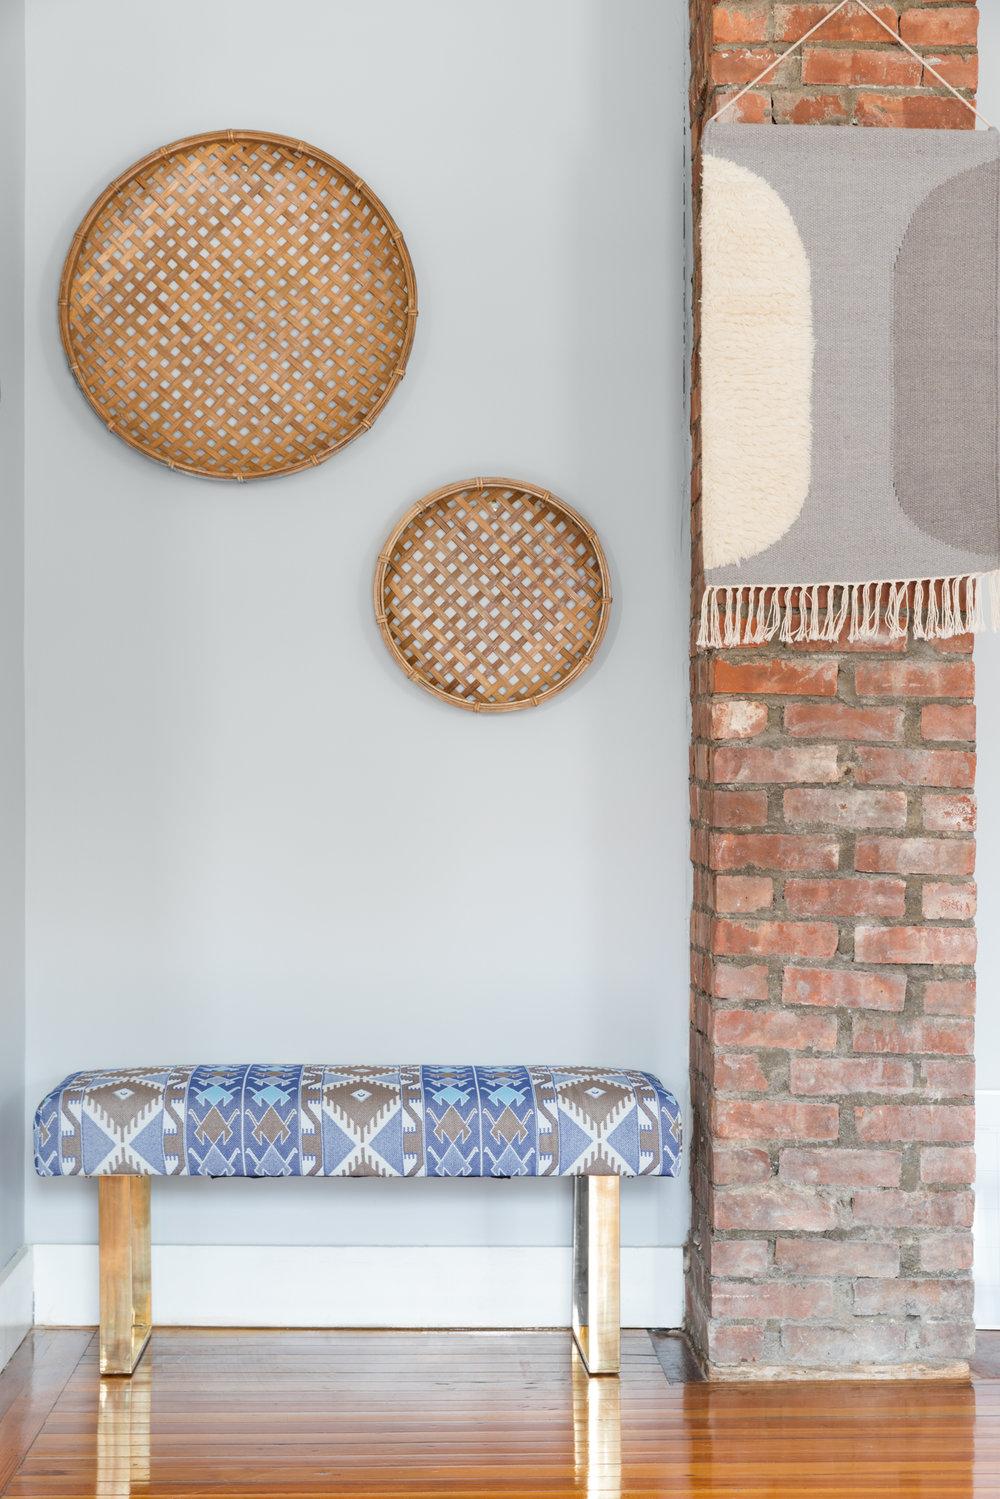 Boo & Rook Herren Wellness modern farmhouse interior design.jpg